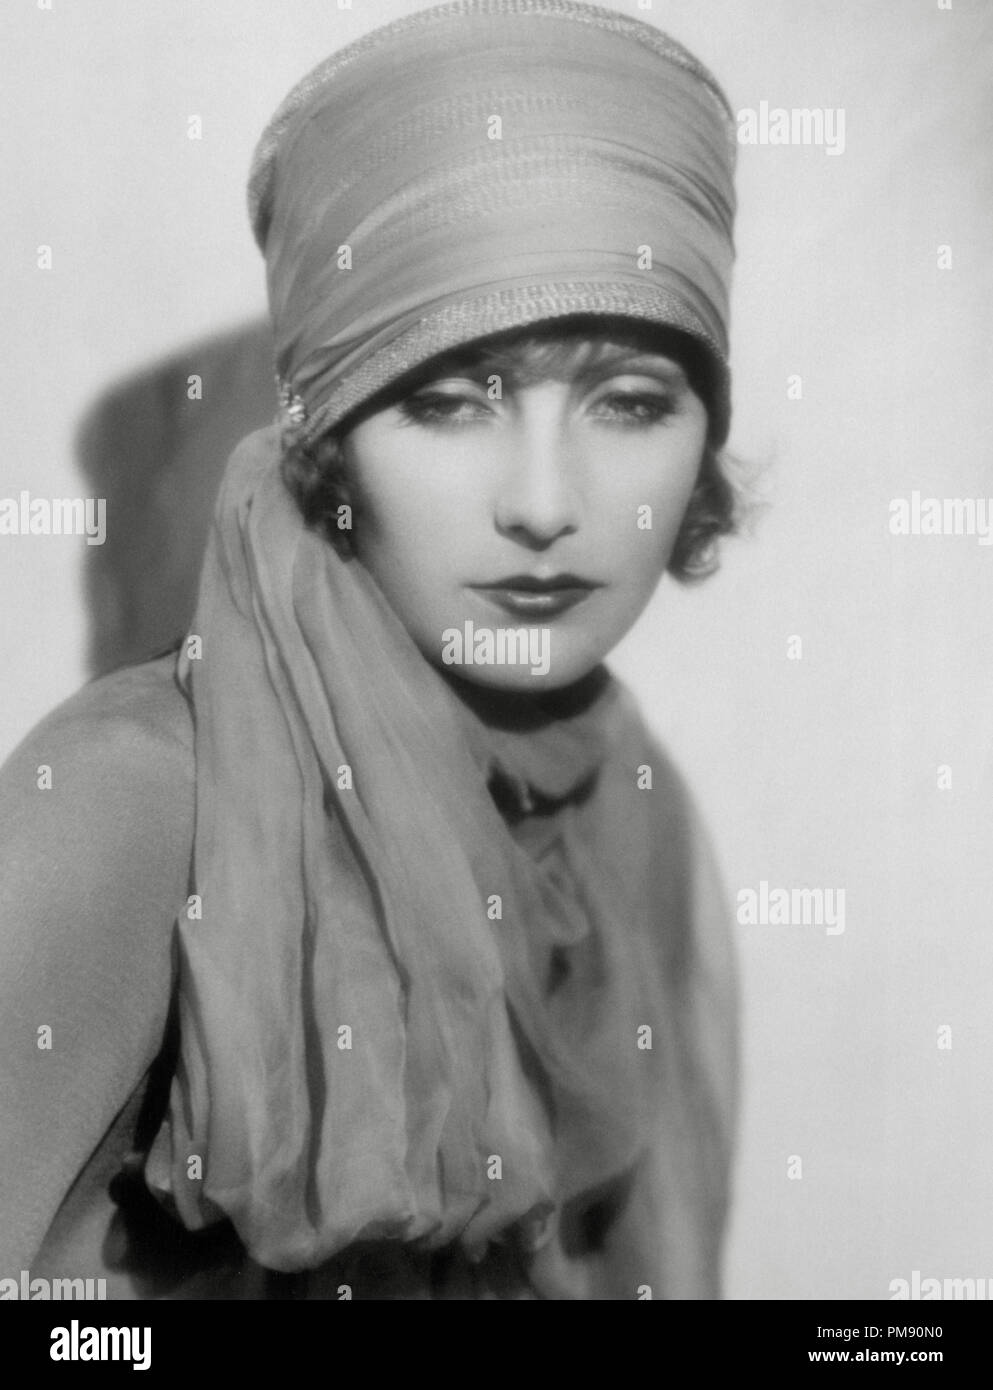 (Archival Classic Cinema - Greta Garbo Retrospective) Greta Garbo, circa 1926. File Reference # 31523_031THA - Stock Image